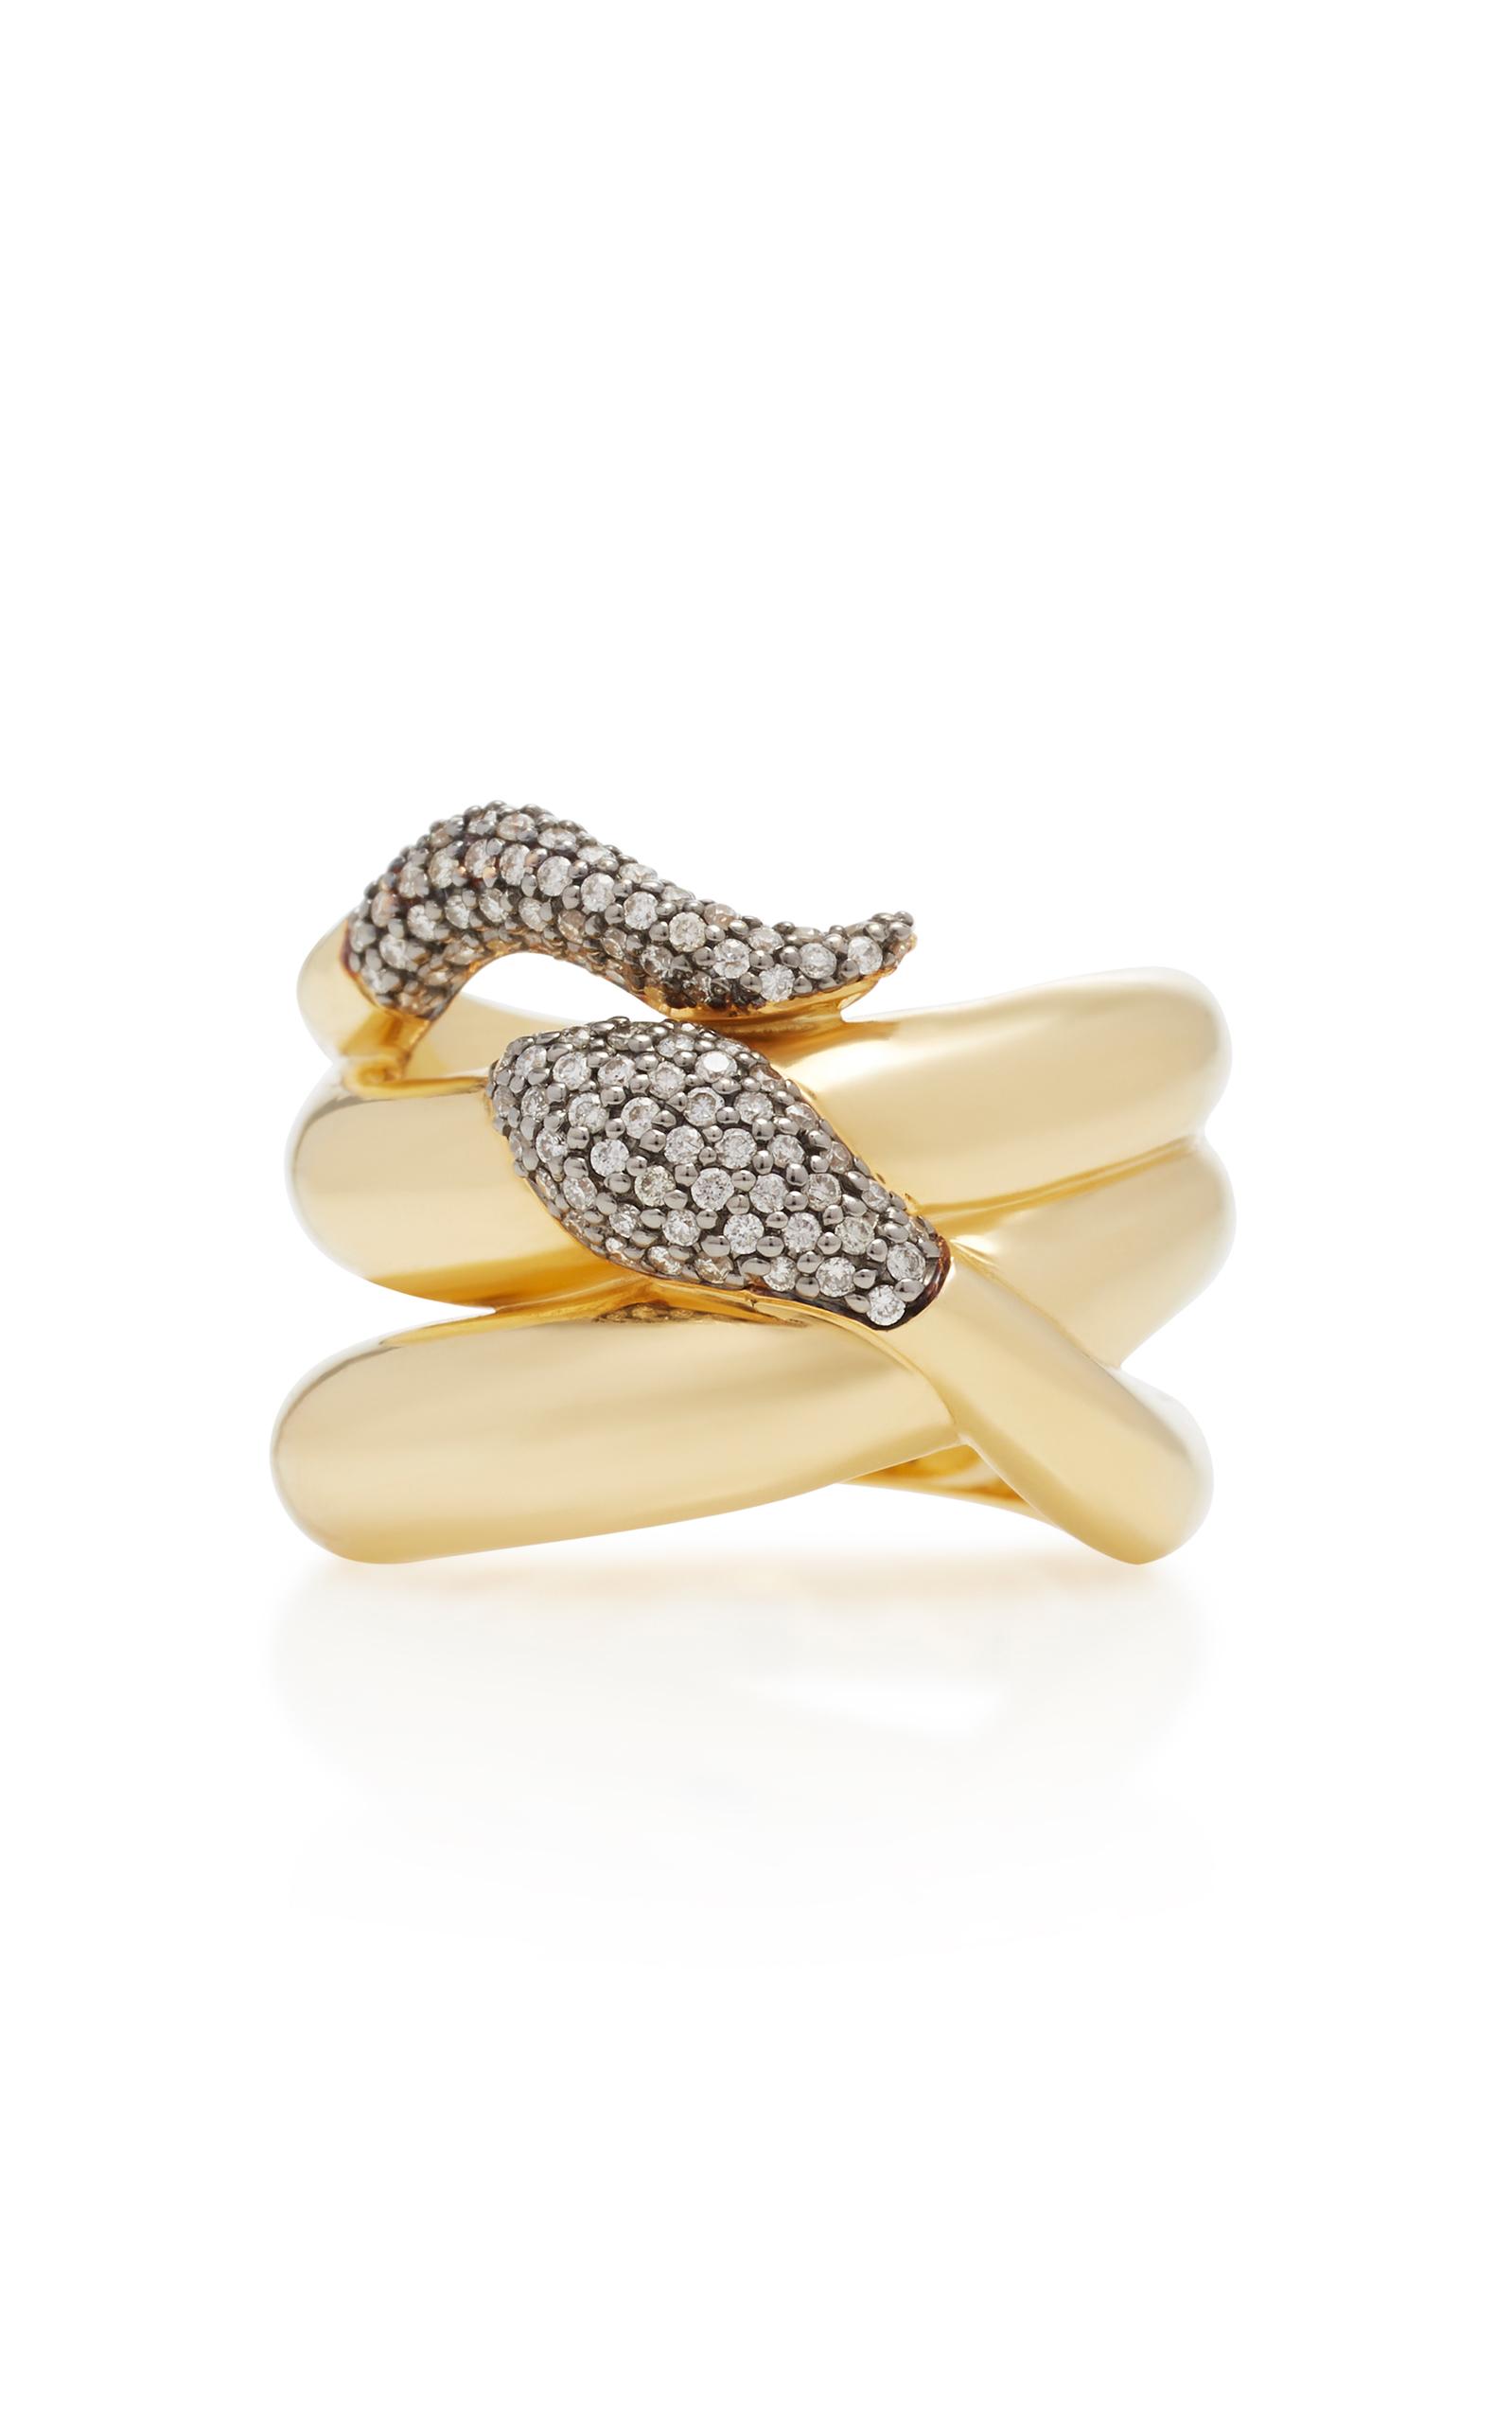 Sorellina 18k Gold Snake Ring Ex7xvP